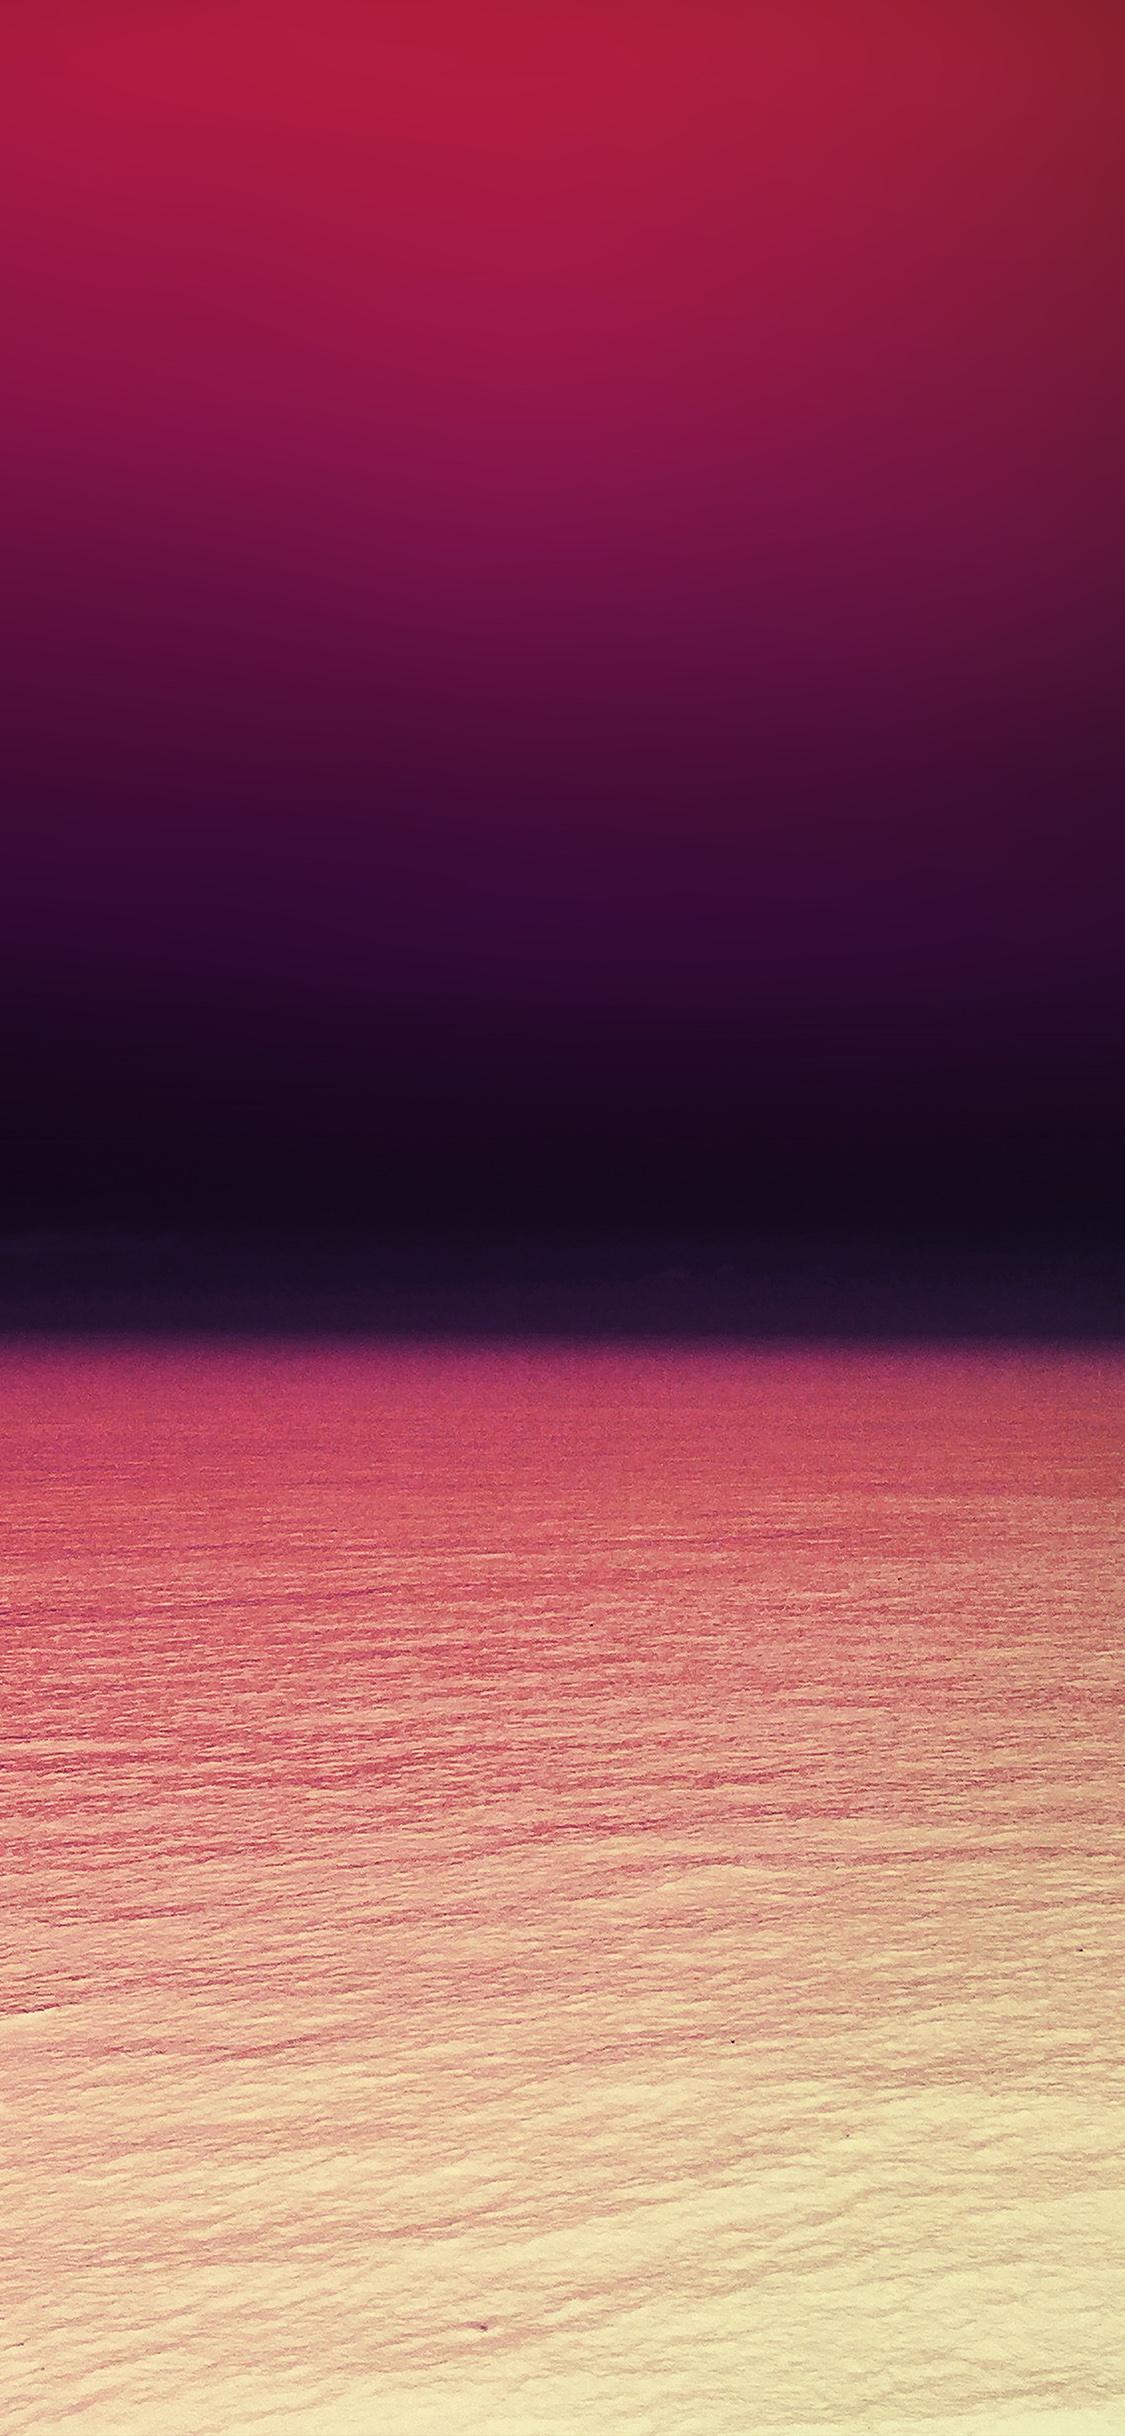 Iphone 11 Wallpaper Red Ocean - HD Wallpaper